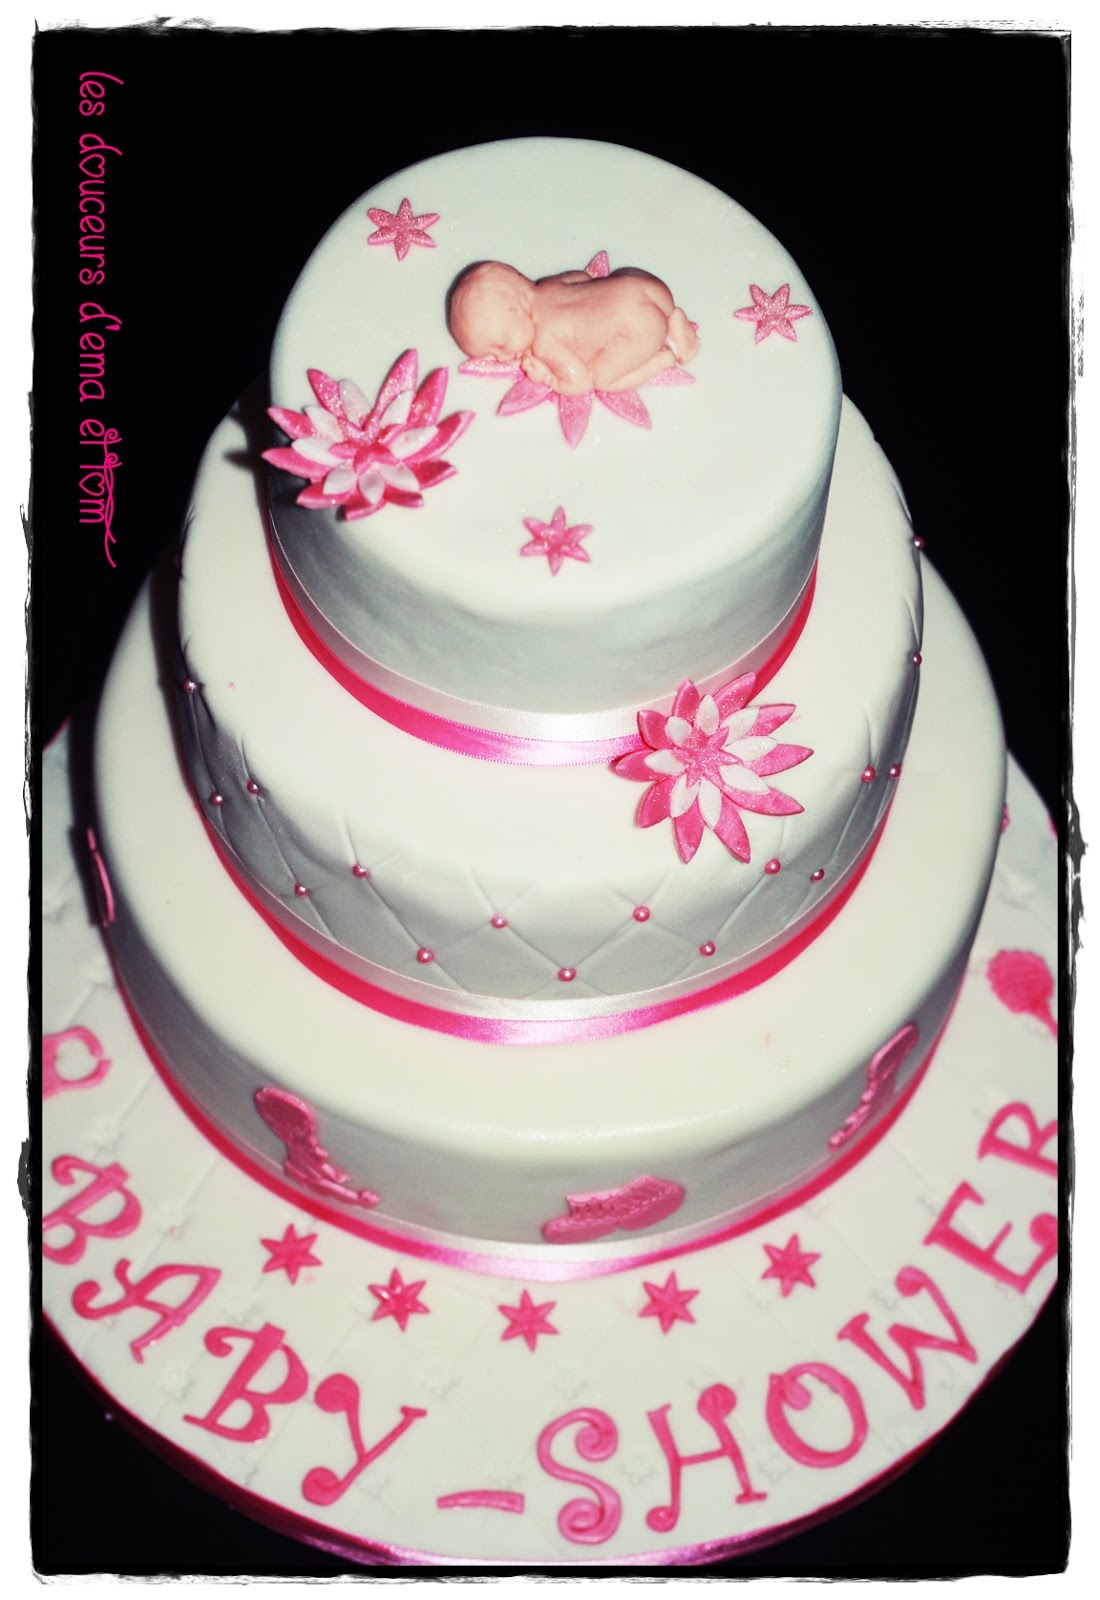 Les douceurs d 39 ema et tom cake design baby shower girly - Gateau bebe fille ...